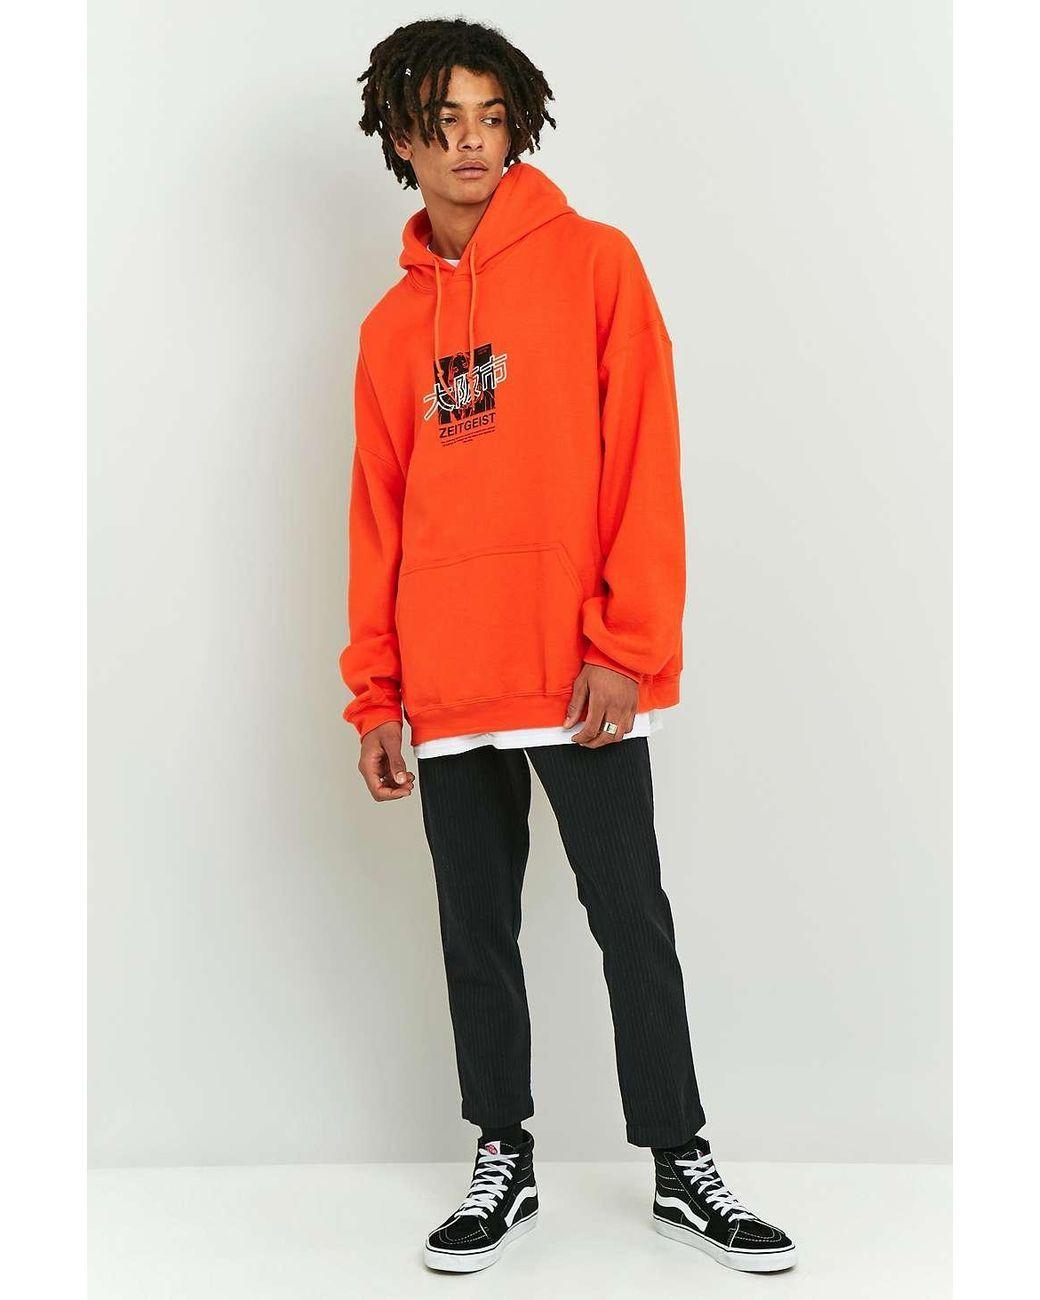 d66177c52b Urban Outfitters | Uo Orange Zeitgeist Hoodie for Men | Lyst | もの ...